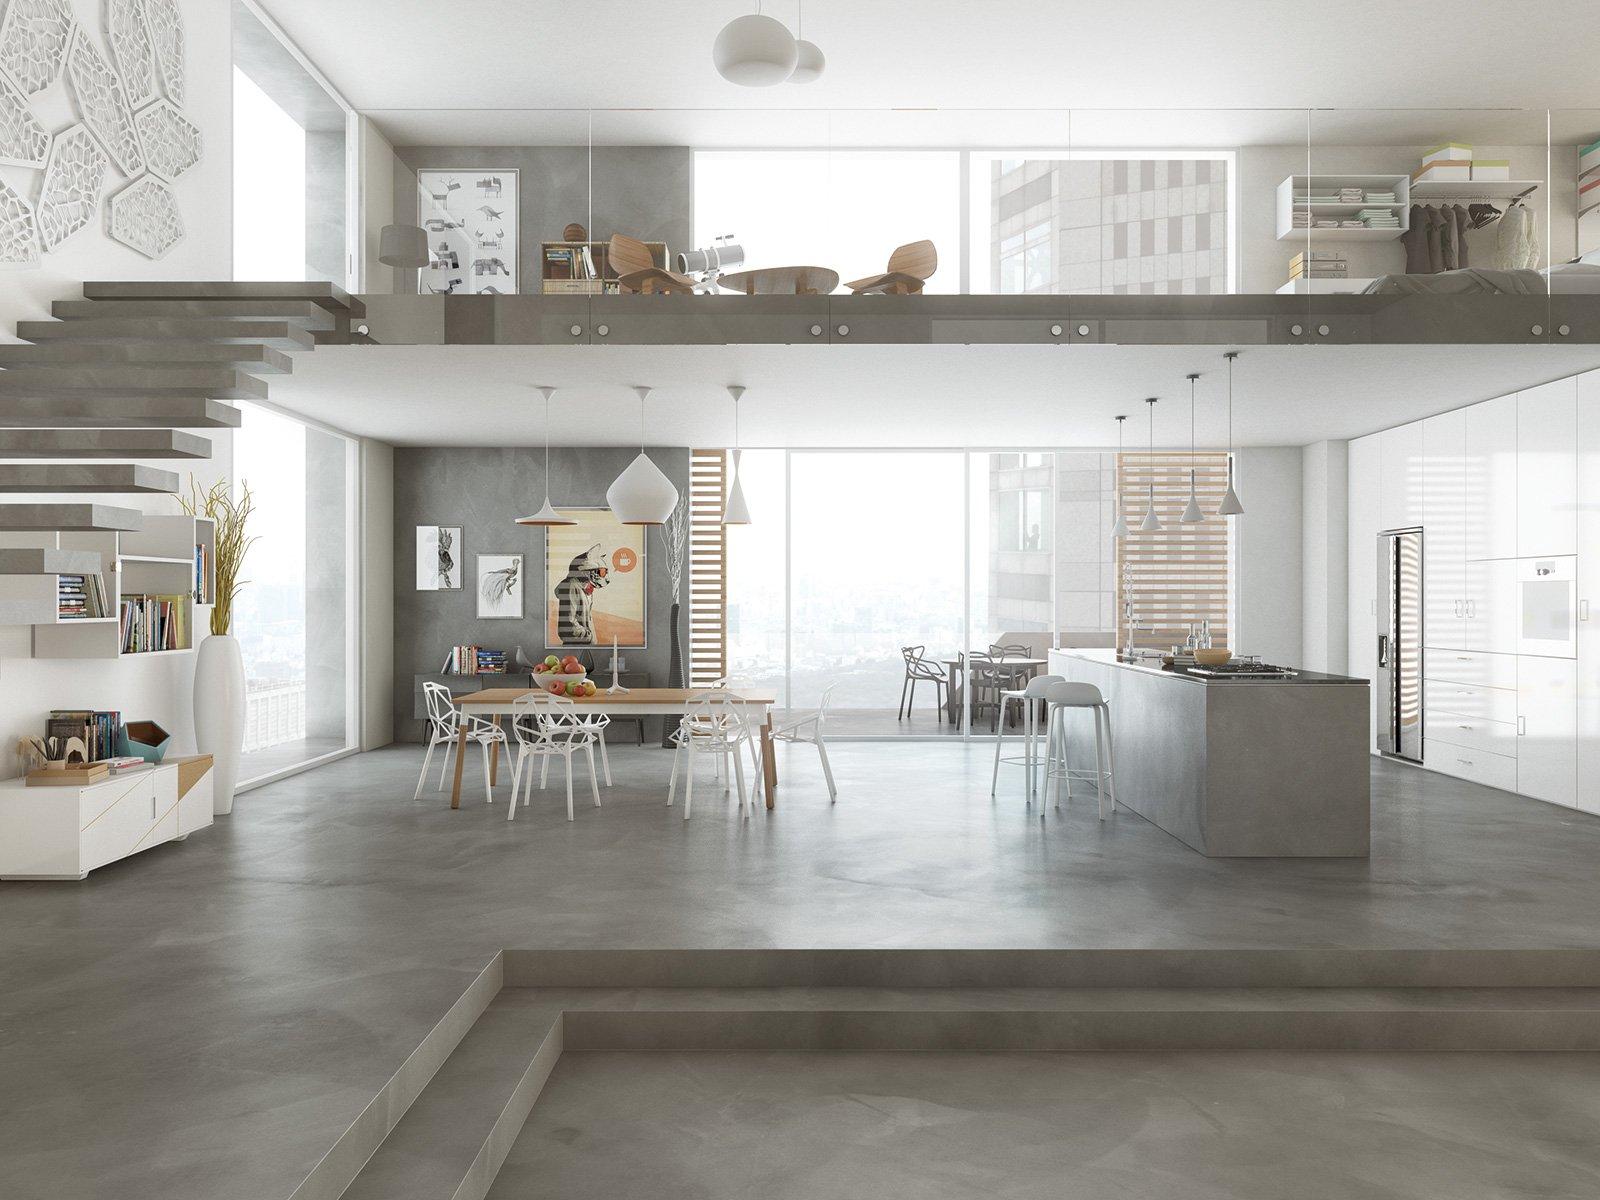 Top Cucina In Resina resina: rivestimenti per pavimenti, pareti, piani di lavoro